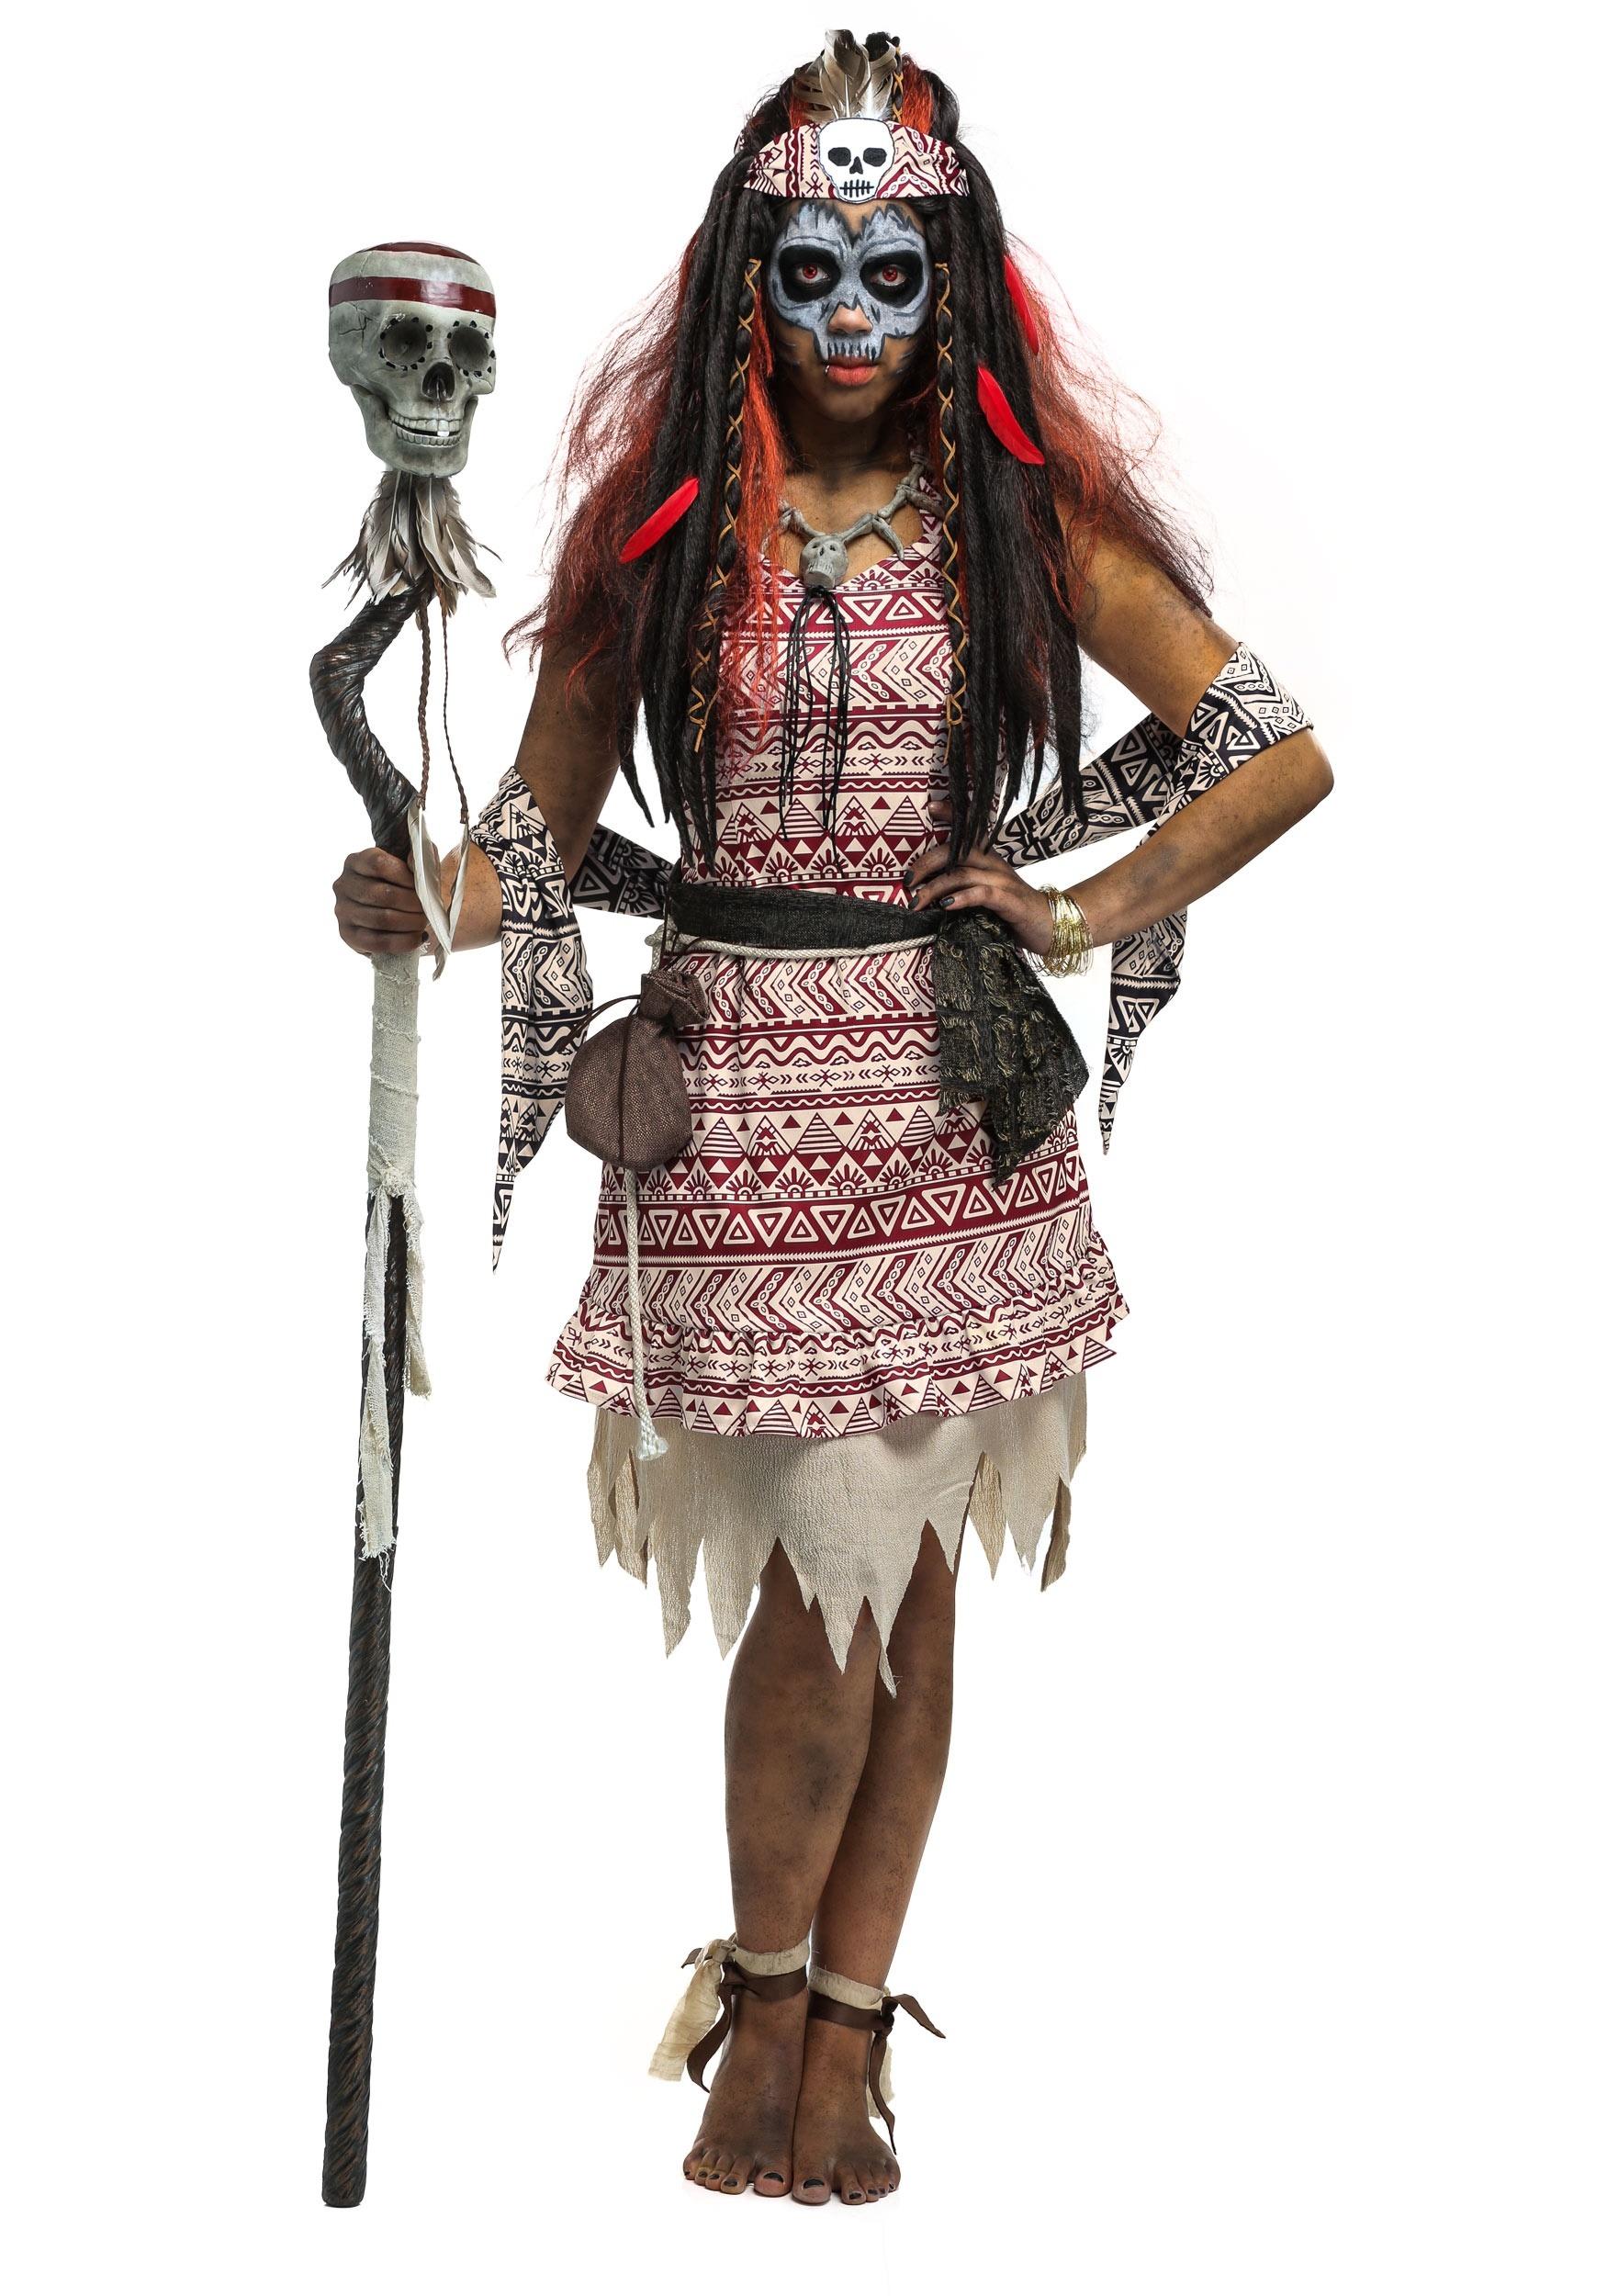 Womenu0027s Voodoo Witch Costume Womenu0027s Voodoo Witch Costume Alt2  sc 1 st  Fun.com & Womens Voodoo Witch Costume